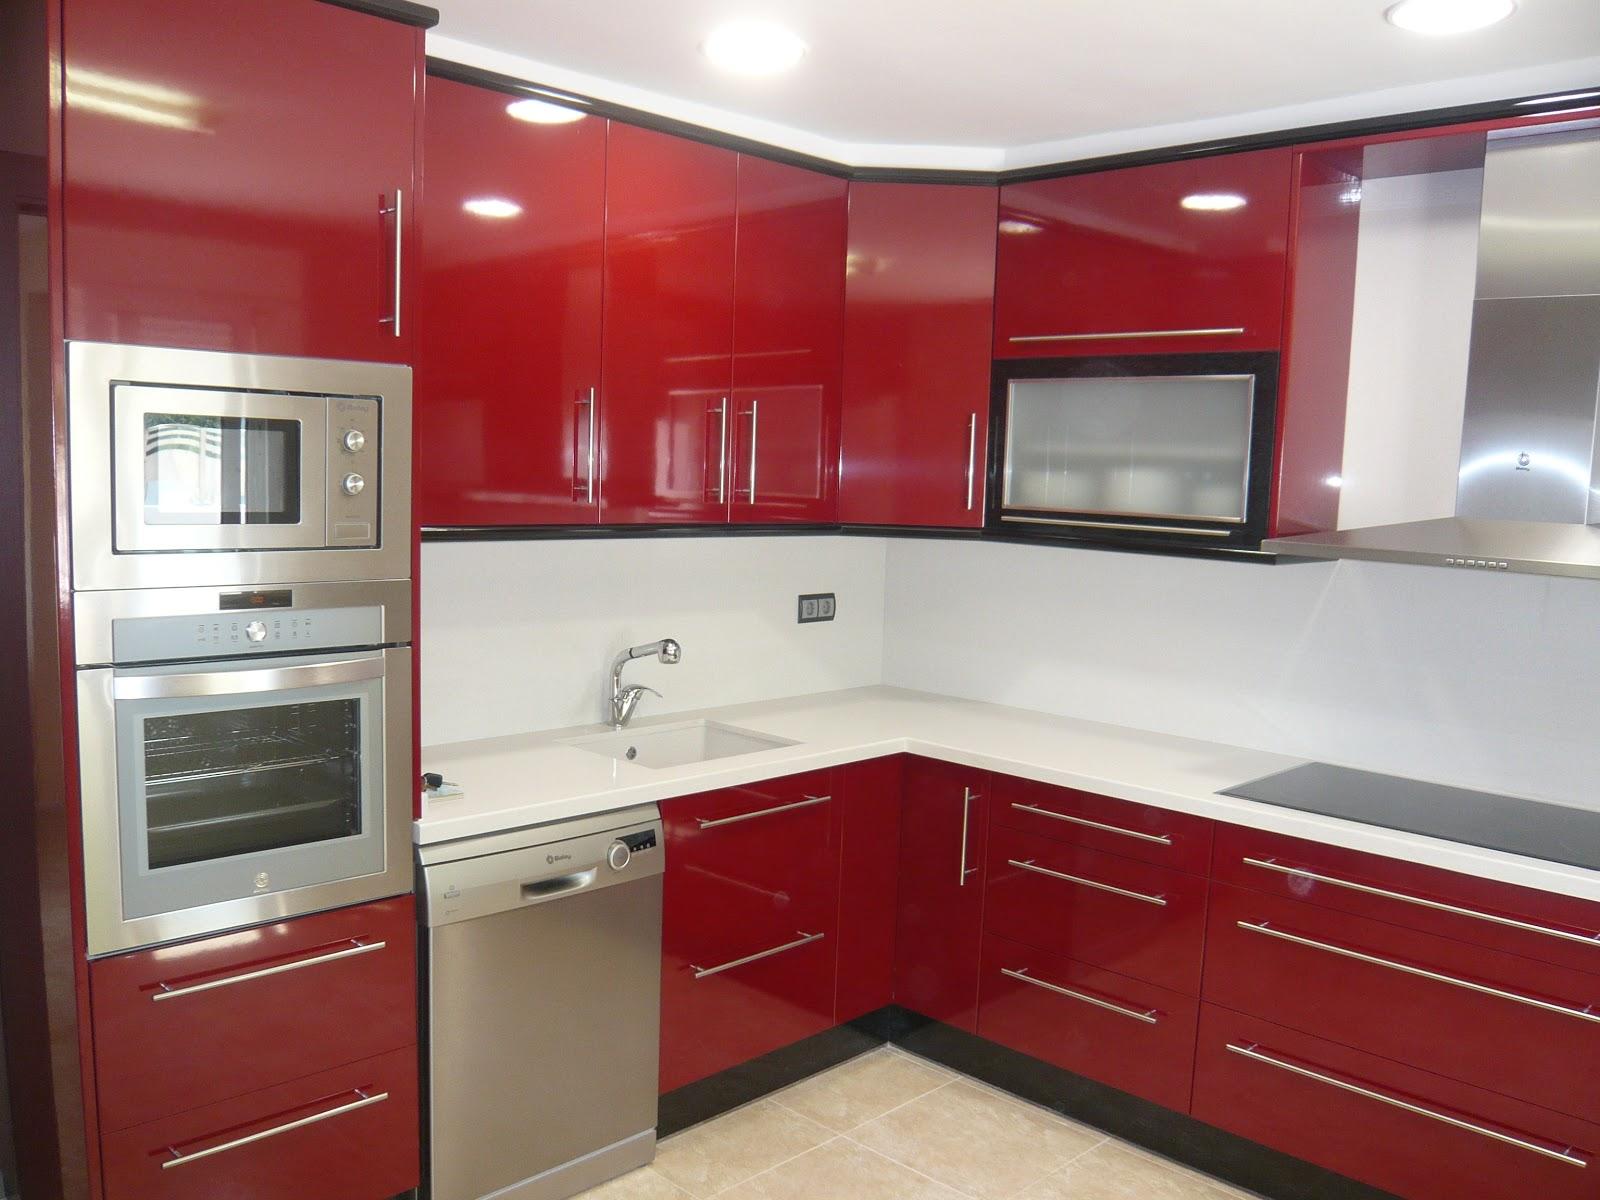 Reuscuina cocina de formica rojo negra - Cocinas de formica ...